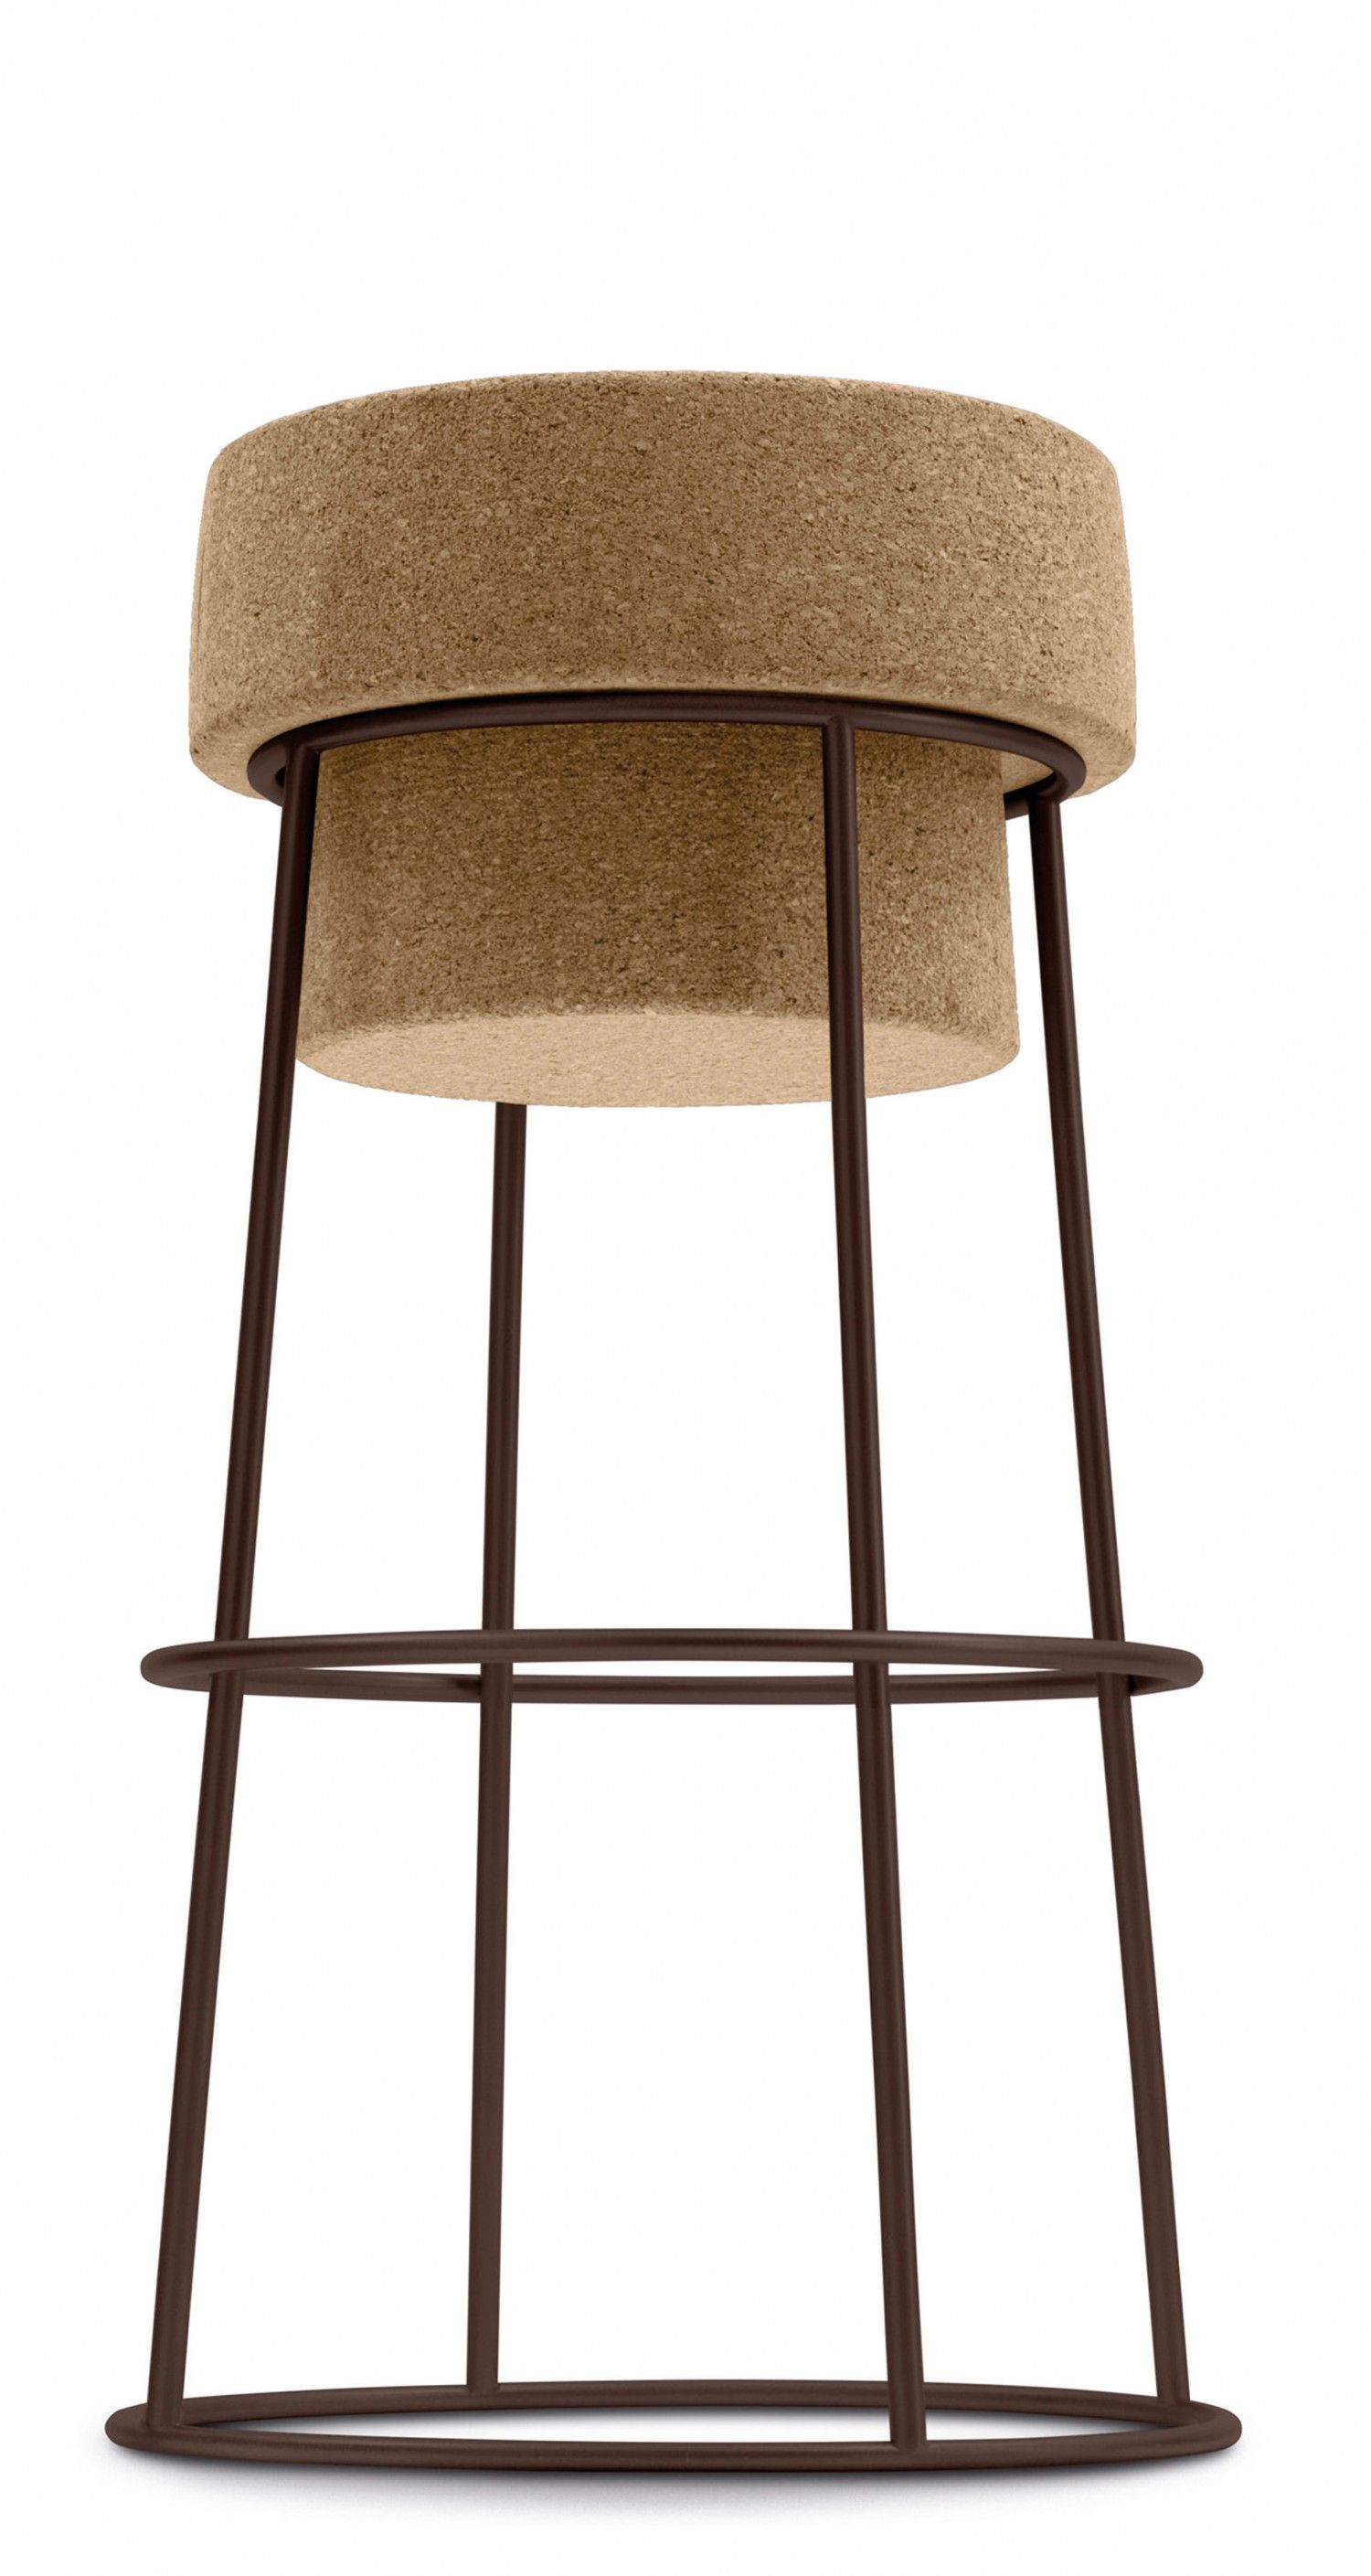 Domitalia Bouchon Stool Frame Bronze Seat Height Counter Bar Stools Modern Bar Stools Counter Stools